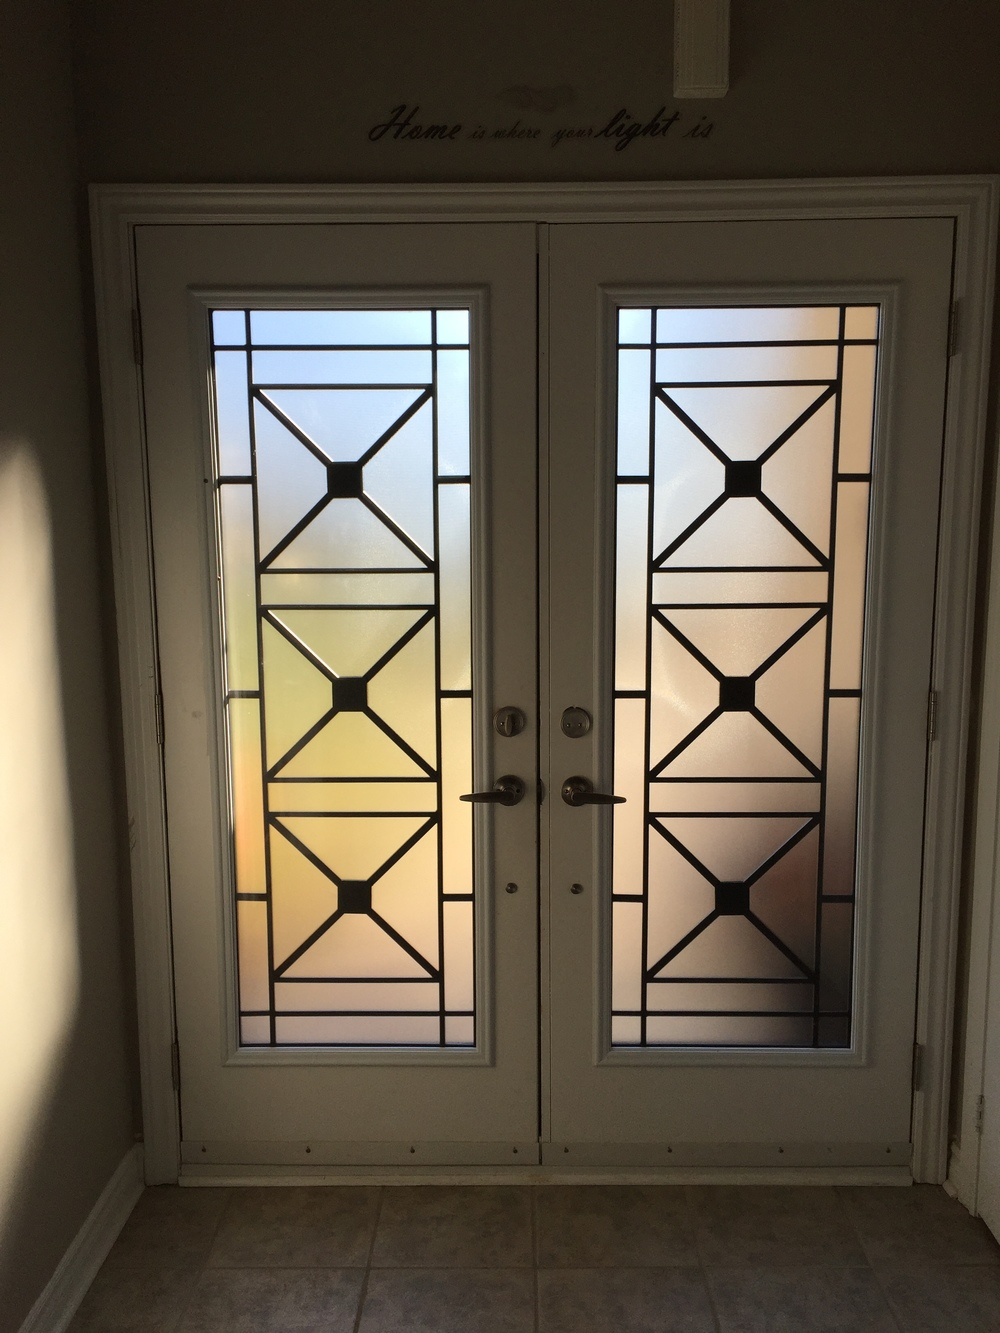 Century-Wrought-Iron-Glass-Door-Inserts-Mississauga-Ontario